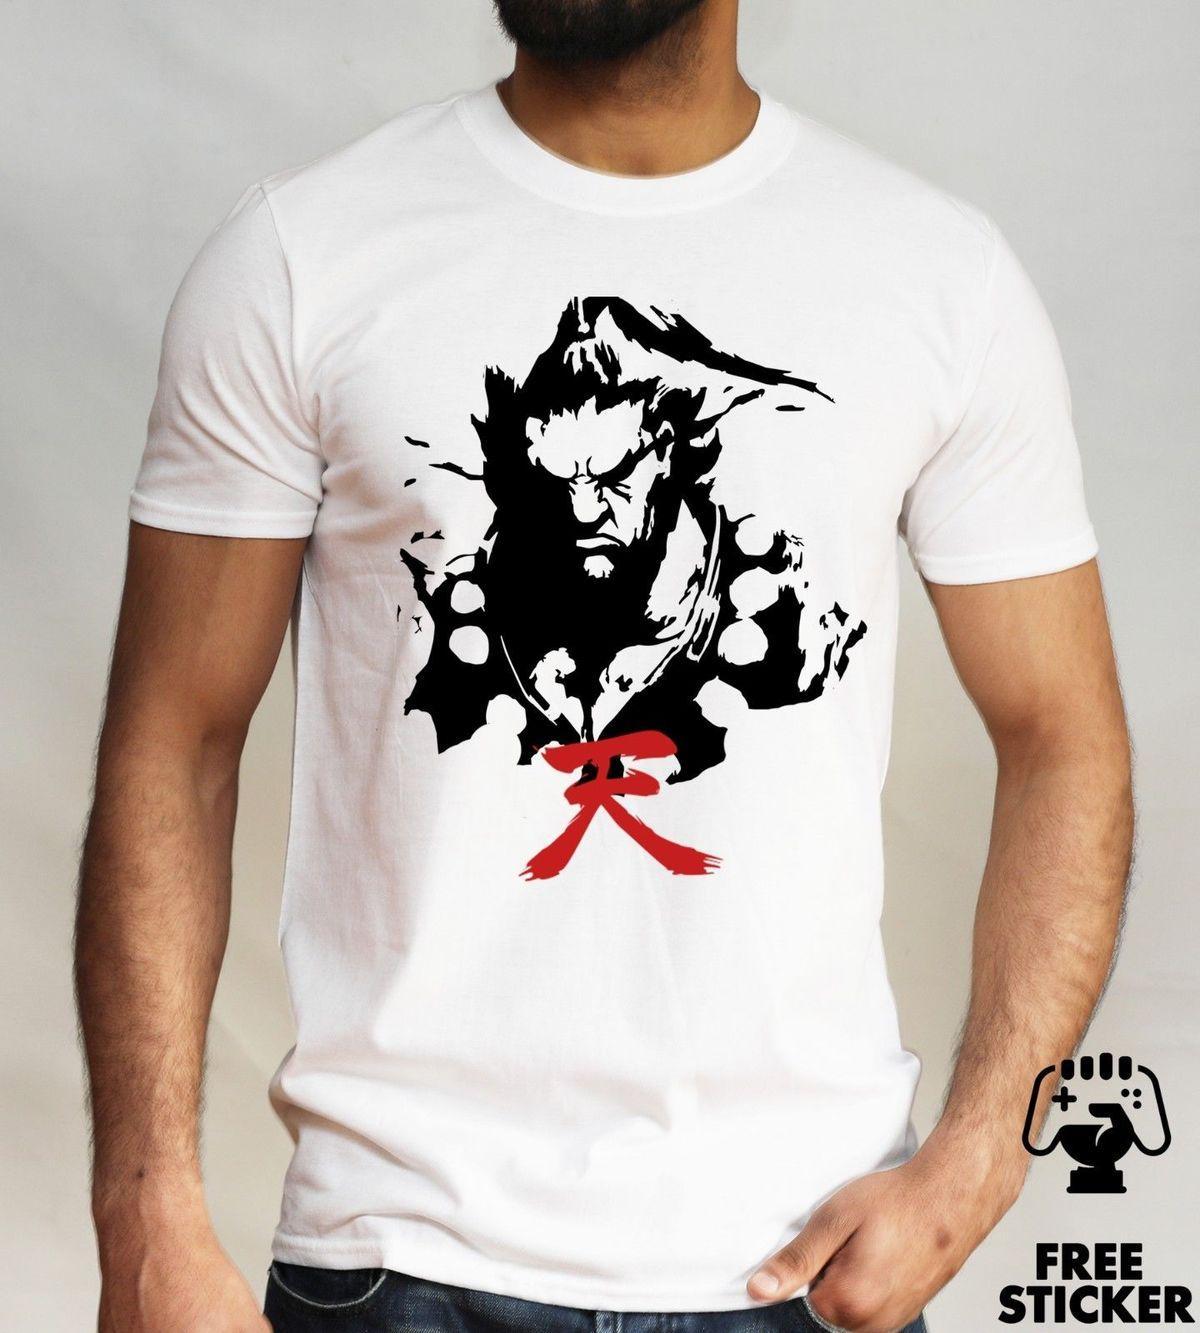 Compre Street Fighter Akuma Camiseta Japonesa Kanji Tee Ryu Ken Retro  Gamers Top Mens De Luckytomorrow 9e70b1af1ab89